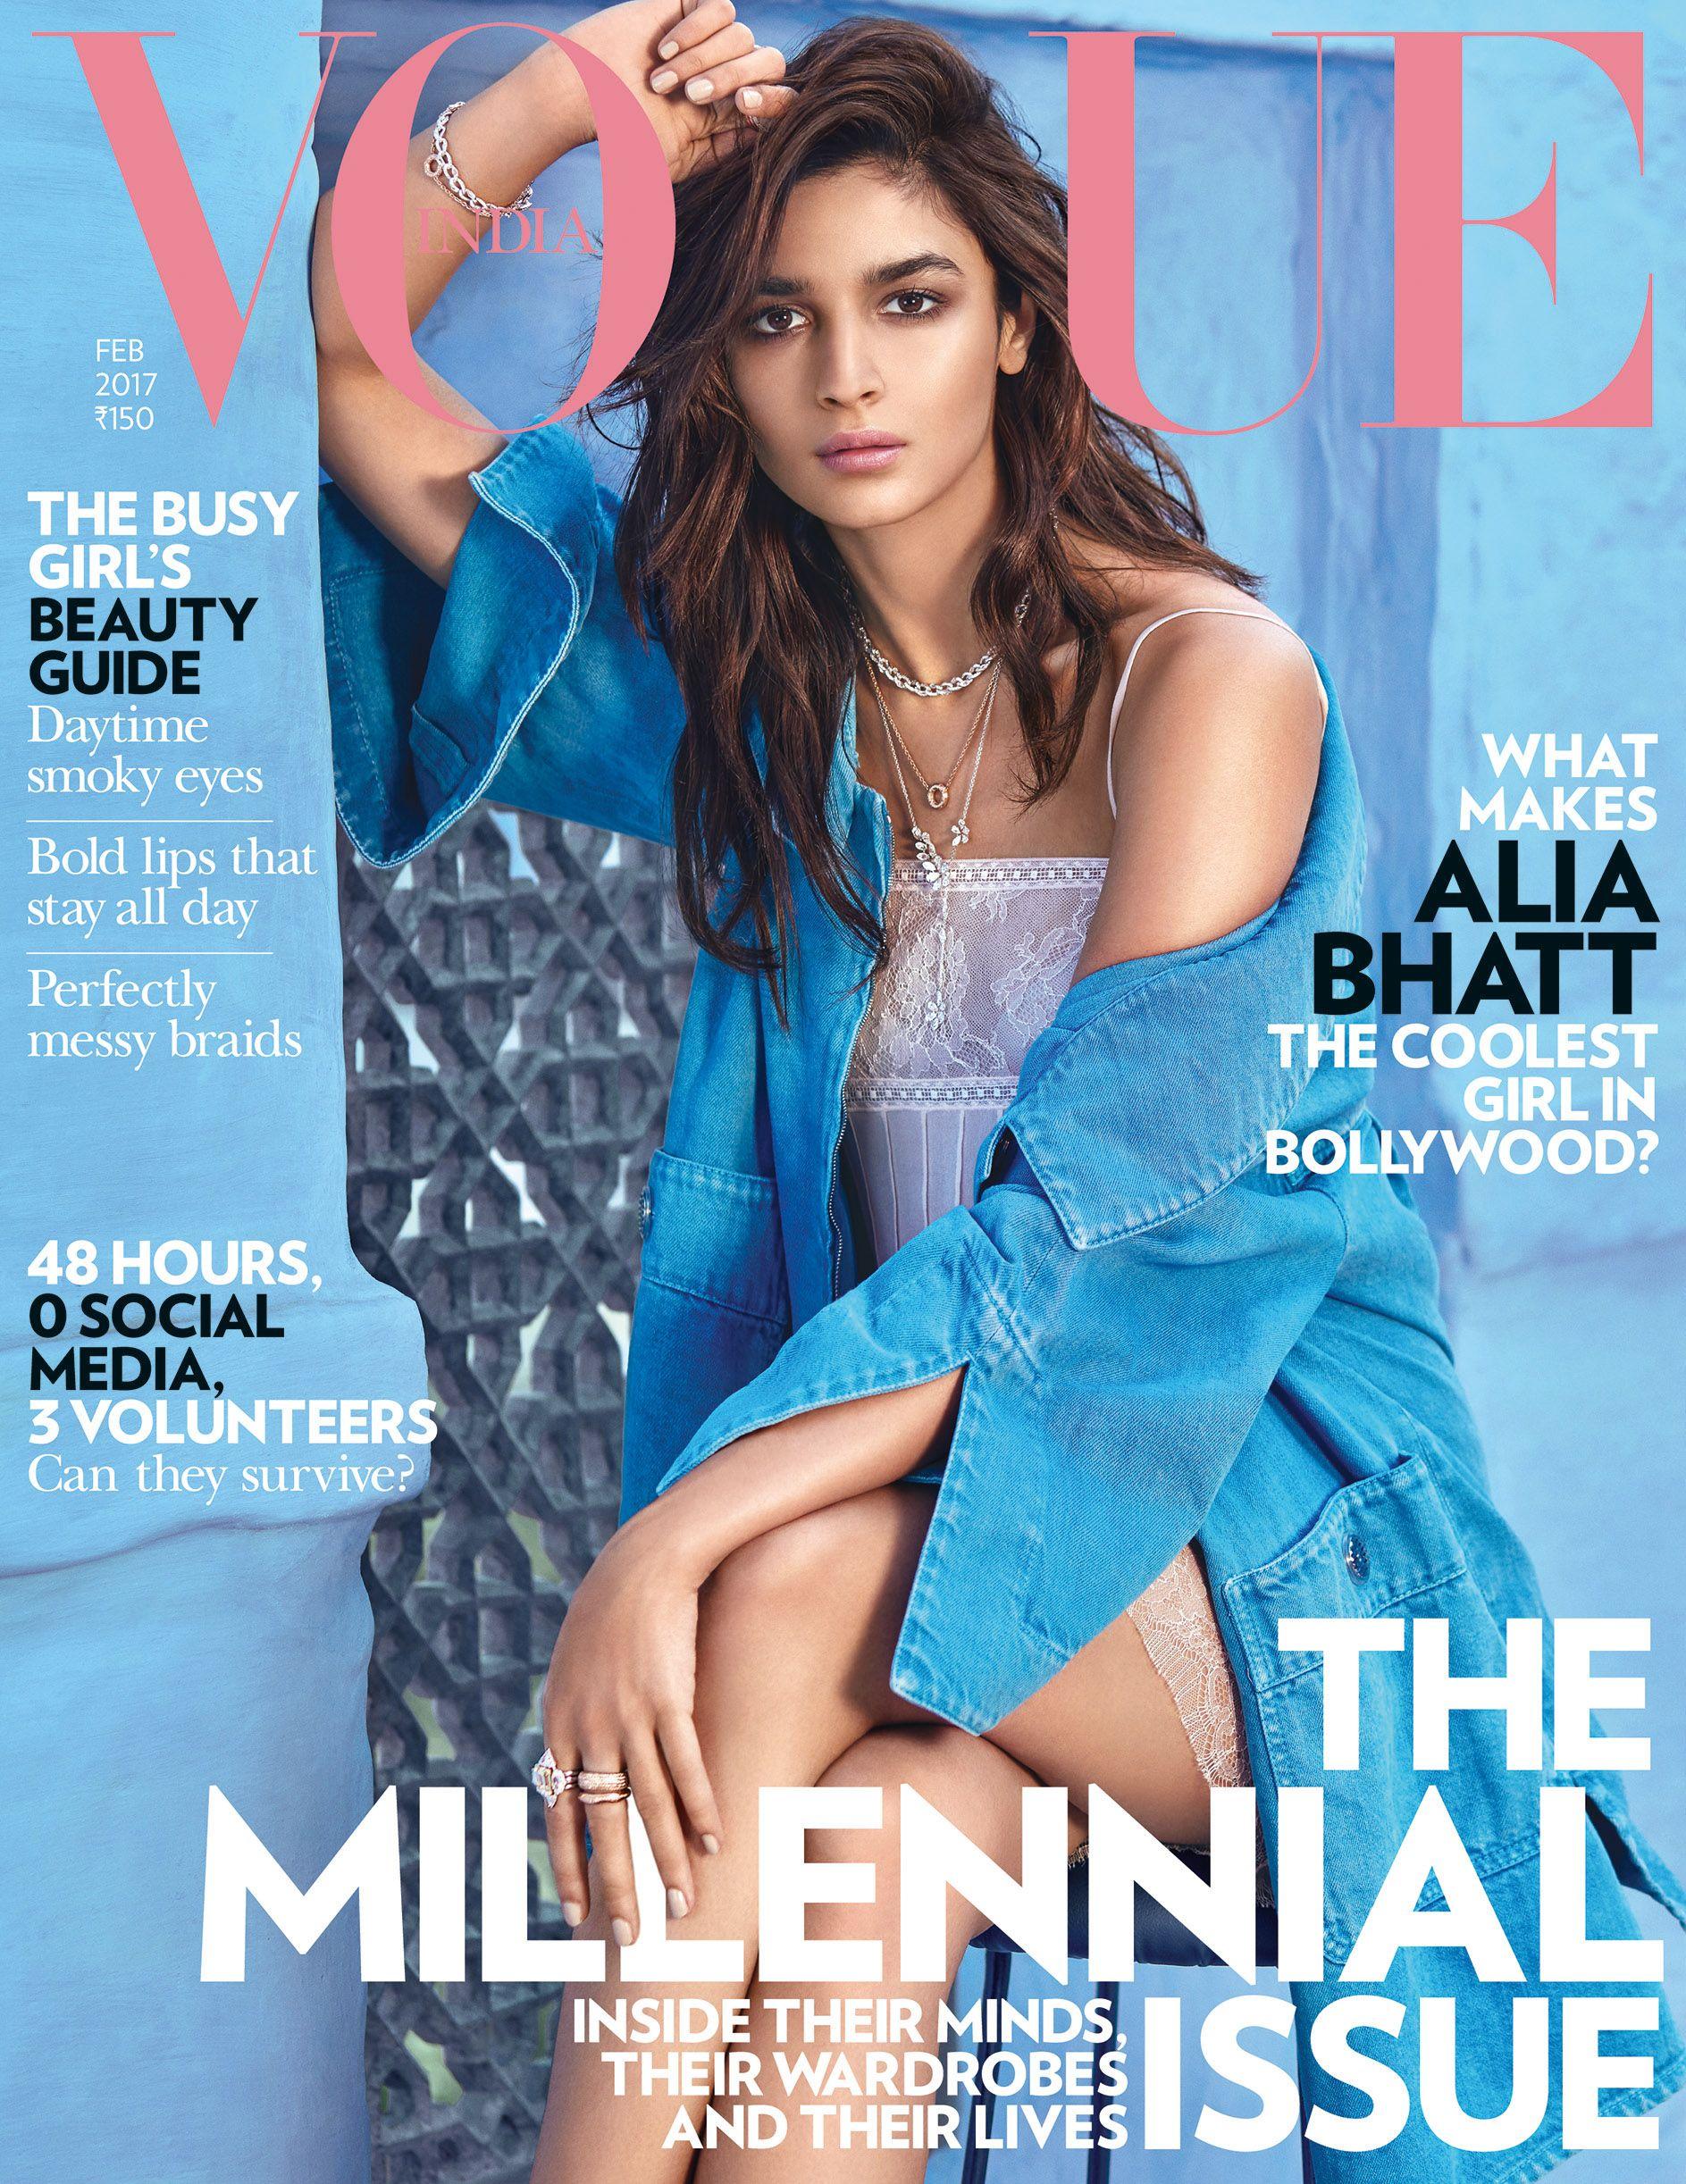 Vogue India, February 2017. Alia Bhatt on the Magazine Cover ...